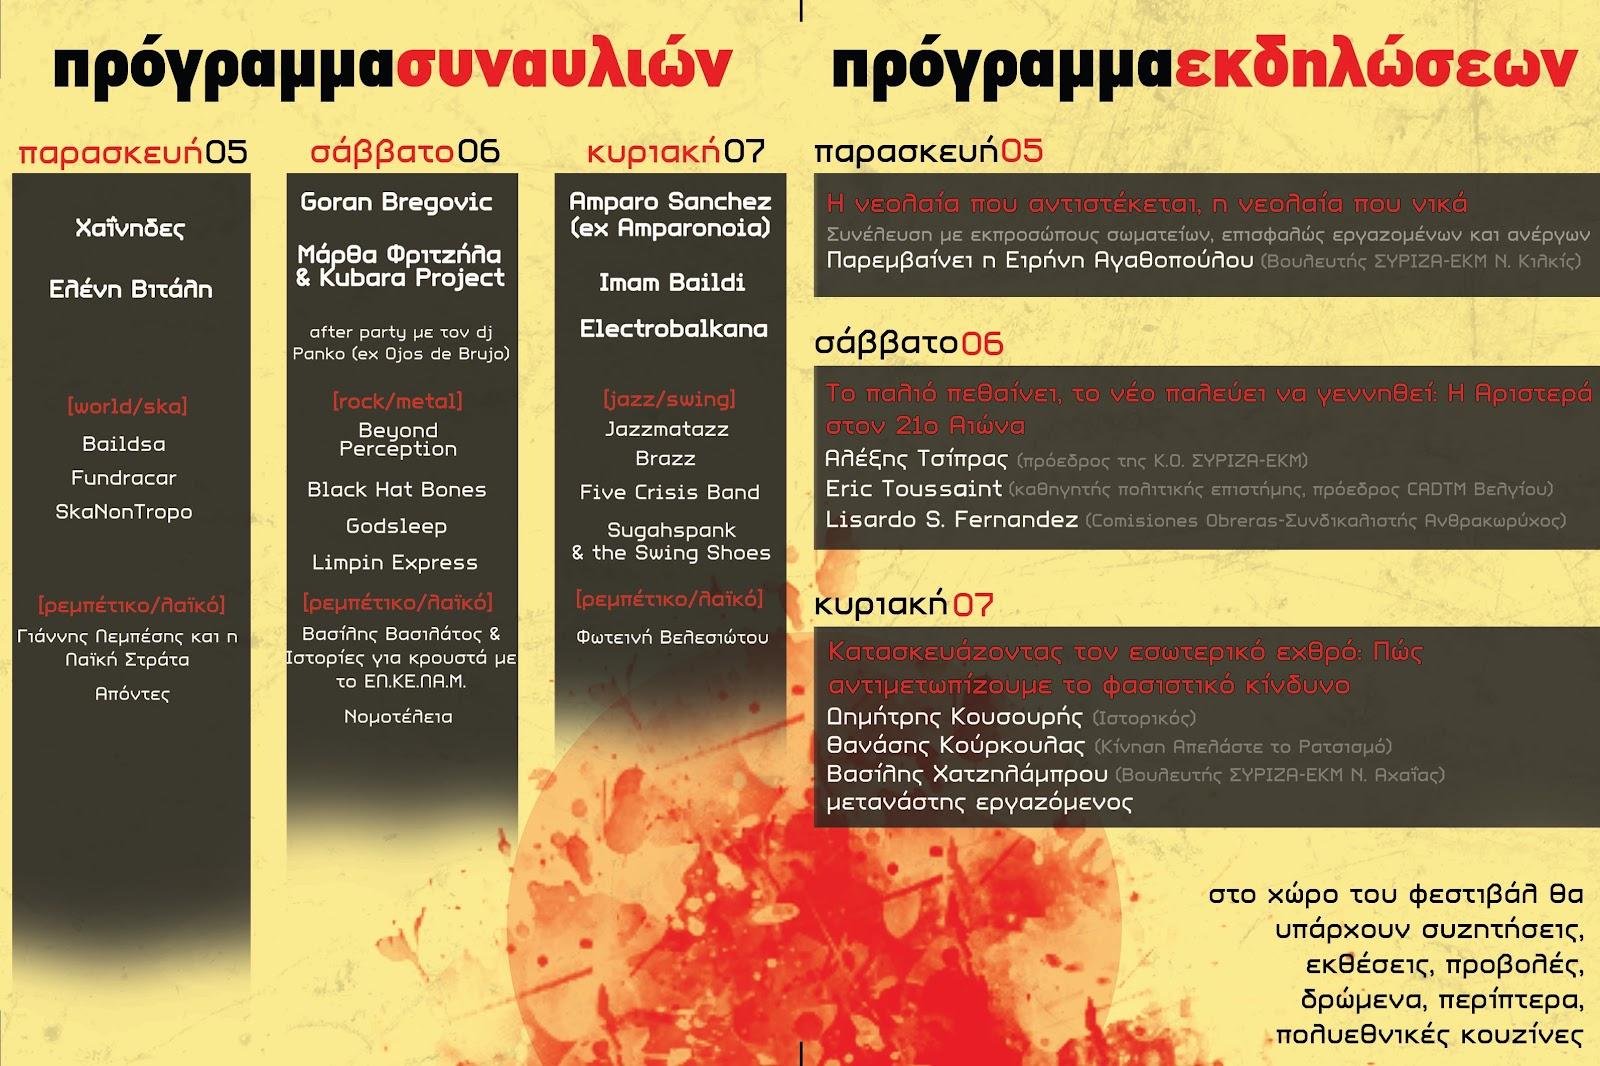 Jazz/Swing σκηνή στο Φεστιβάλ Νέων Σύριζα flyer